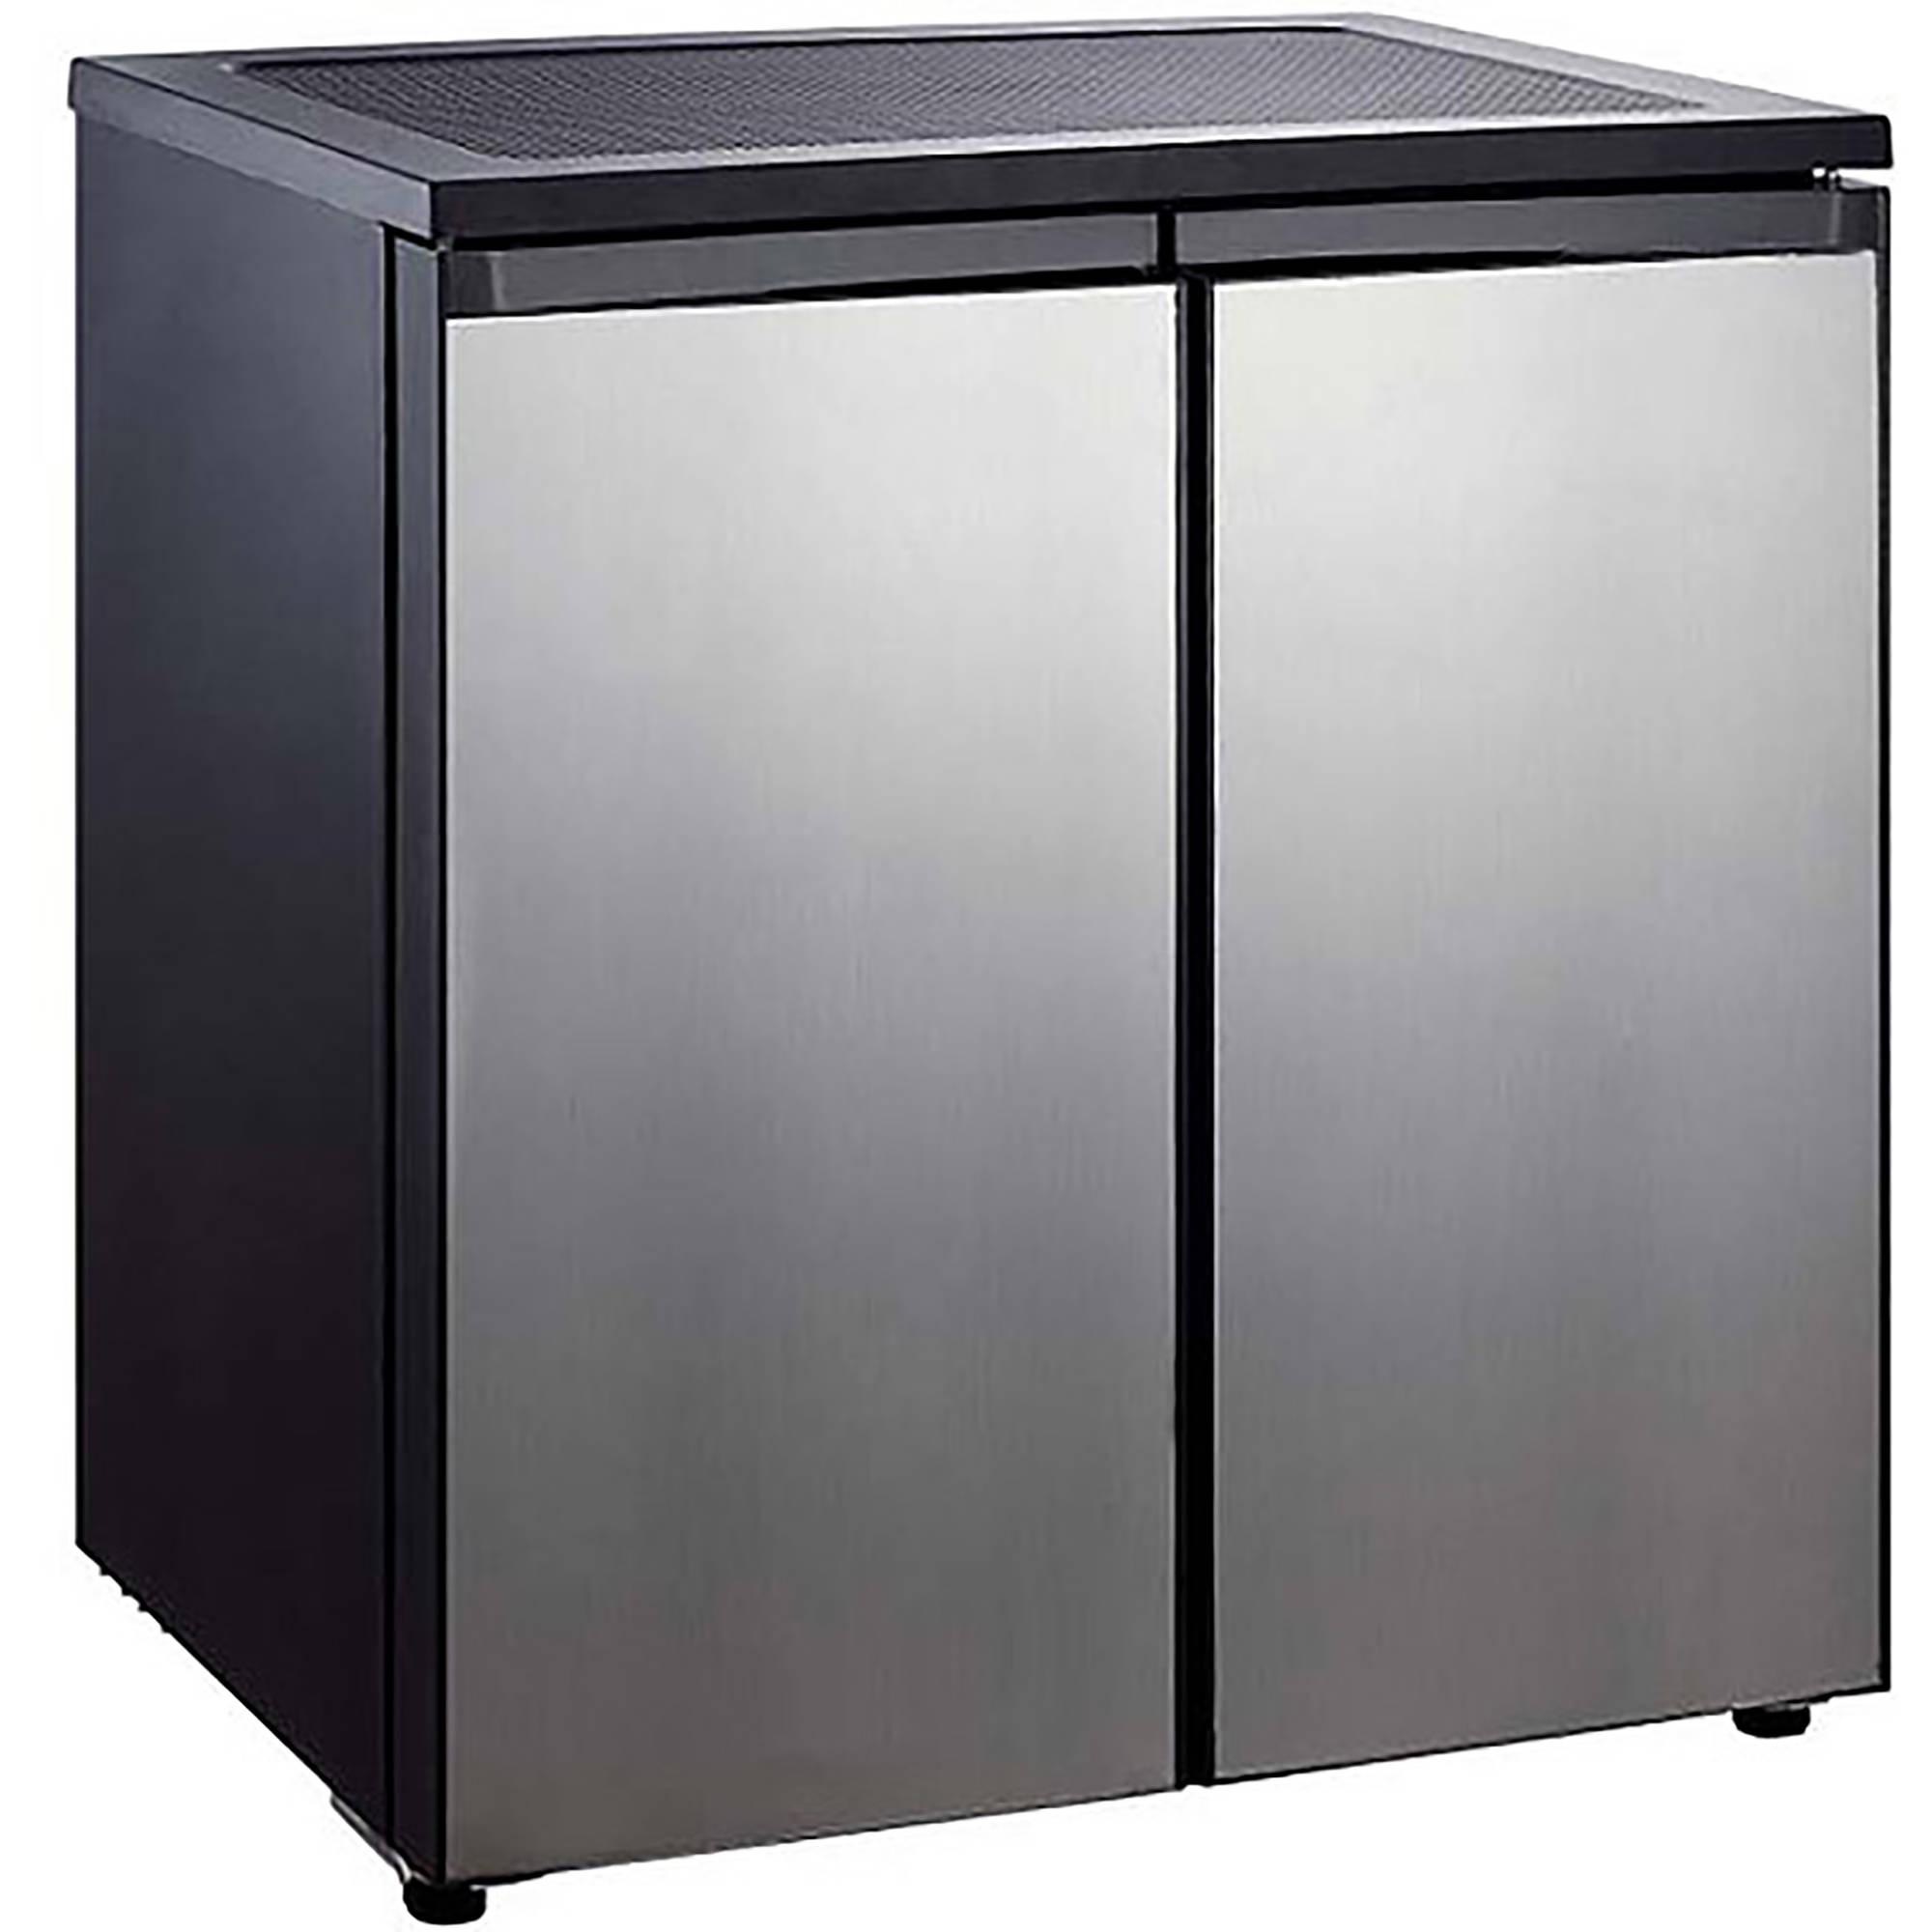 Igloo 5.5-cu. ft. Side-by-Side 2-Door Refrigerator/Freezer, Stainless Steel